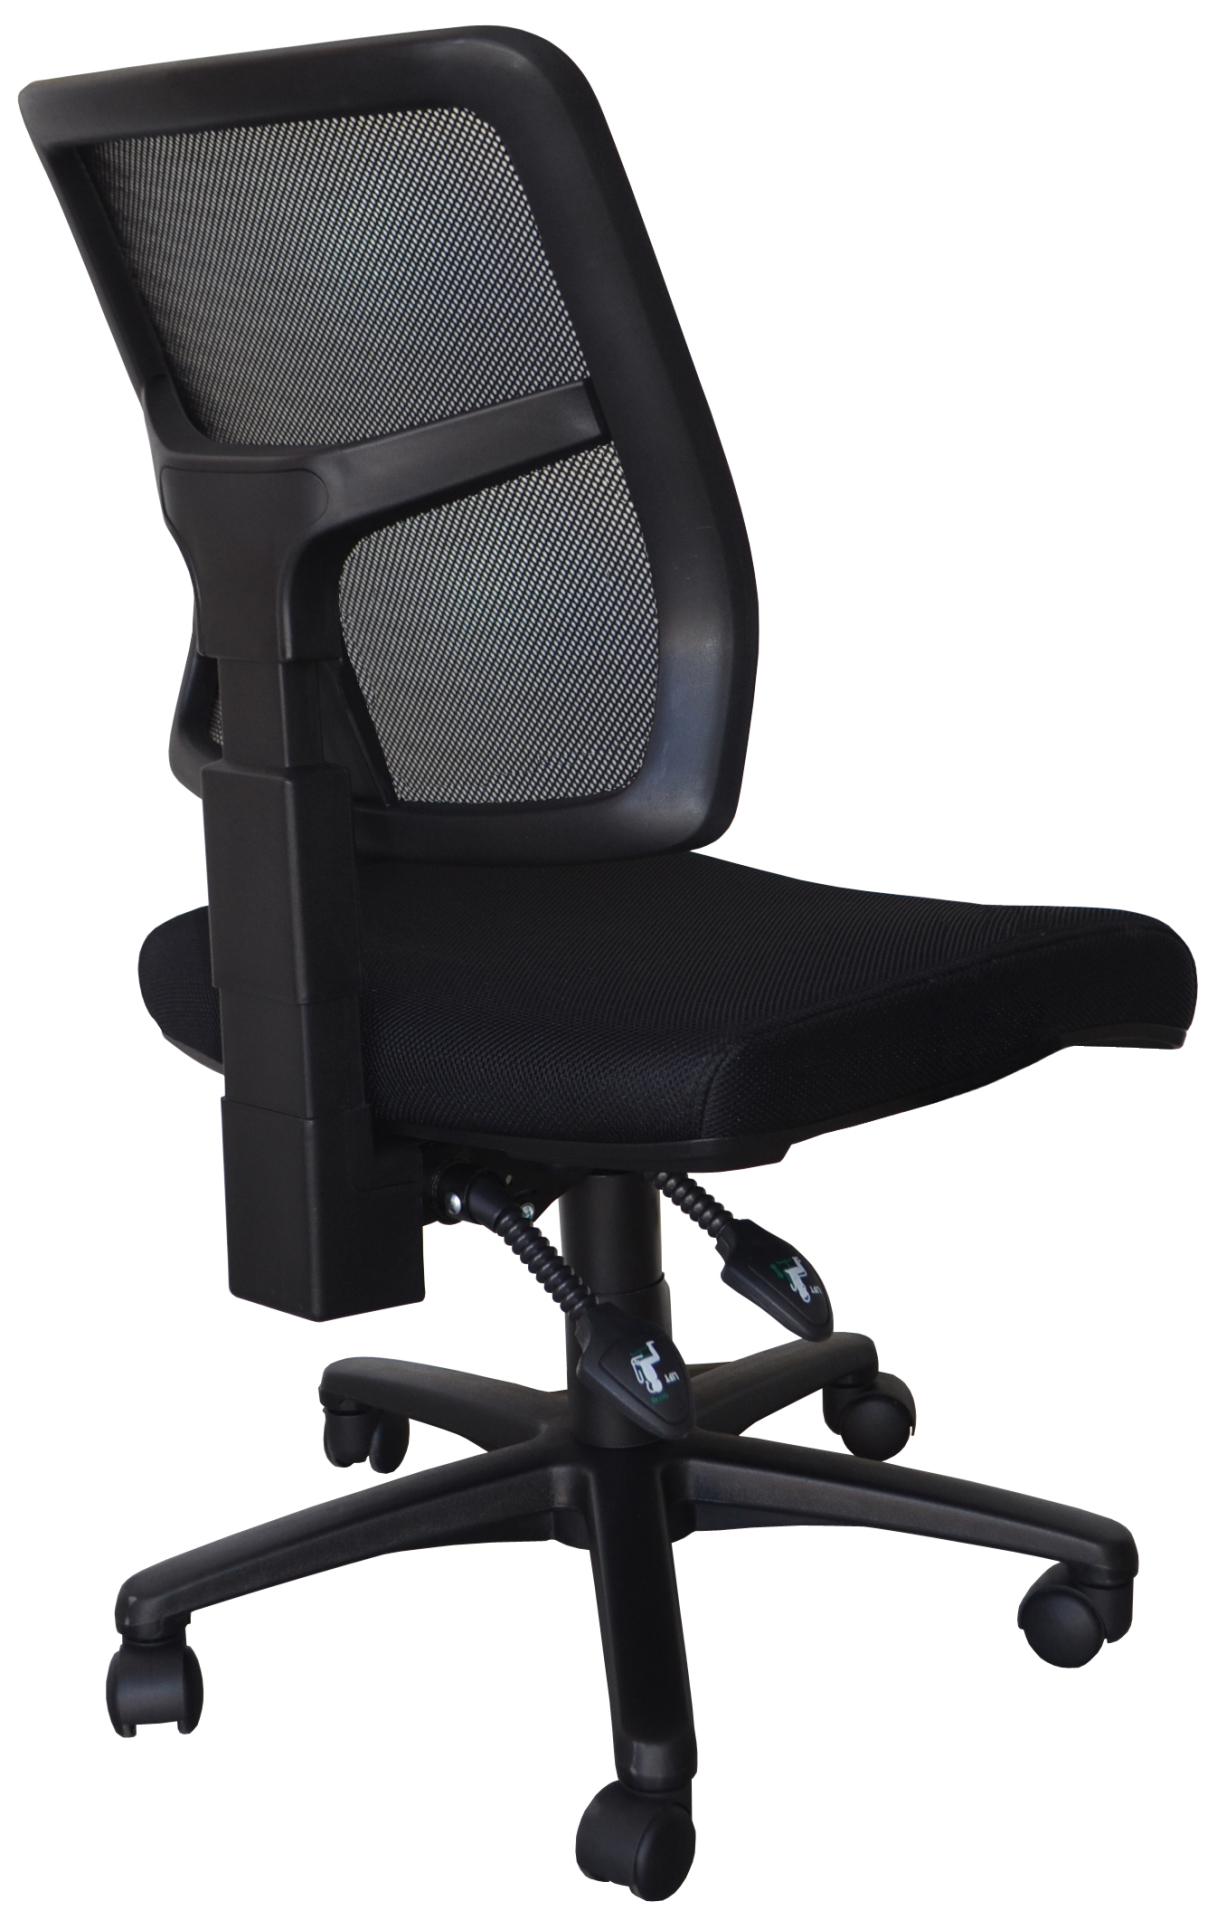 Direct Ergonomics   Sydney Office Furniture   Ergonomic Furniture   Ergonomic Seating   Executive and Task Seating   Meeting Room Chair   Breeze 150